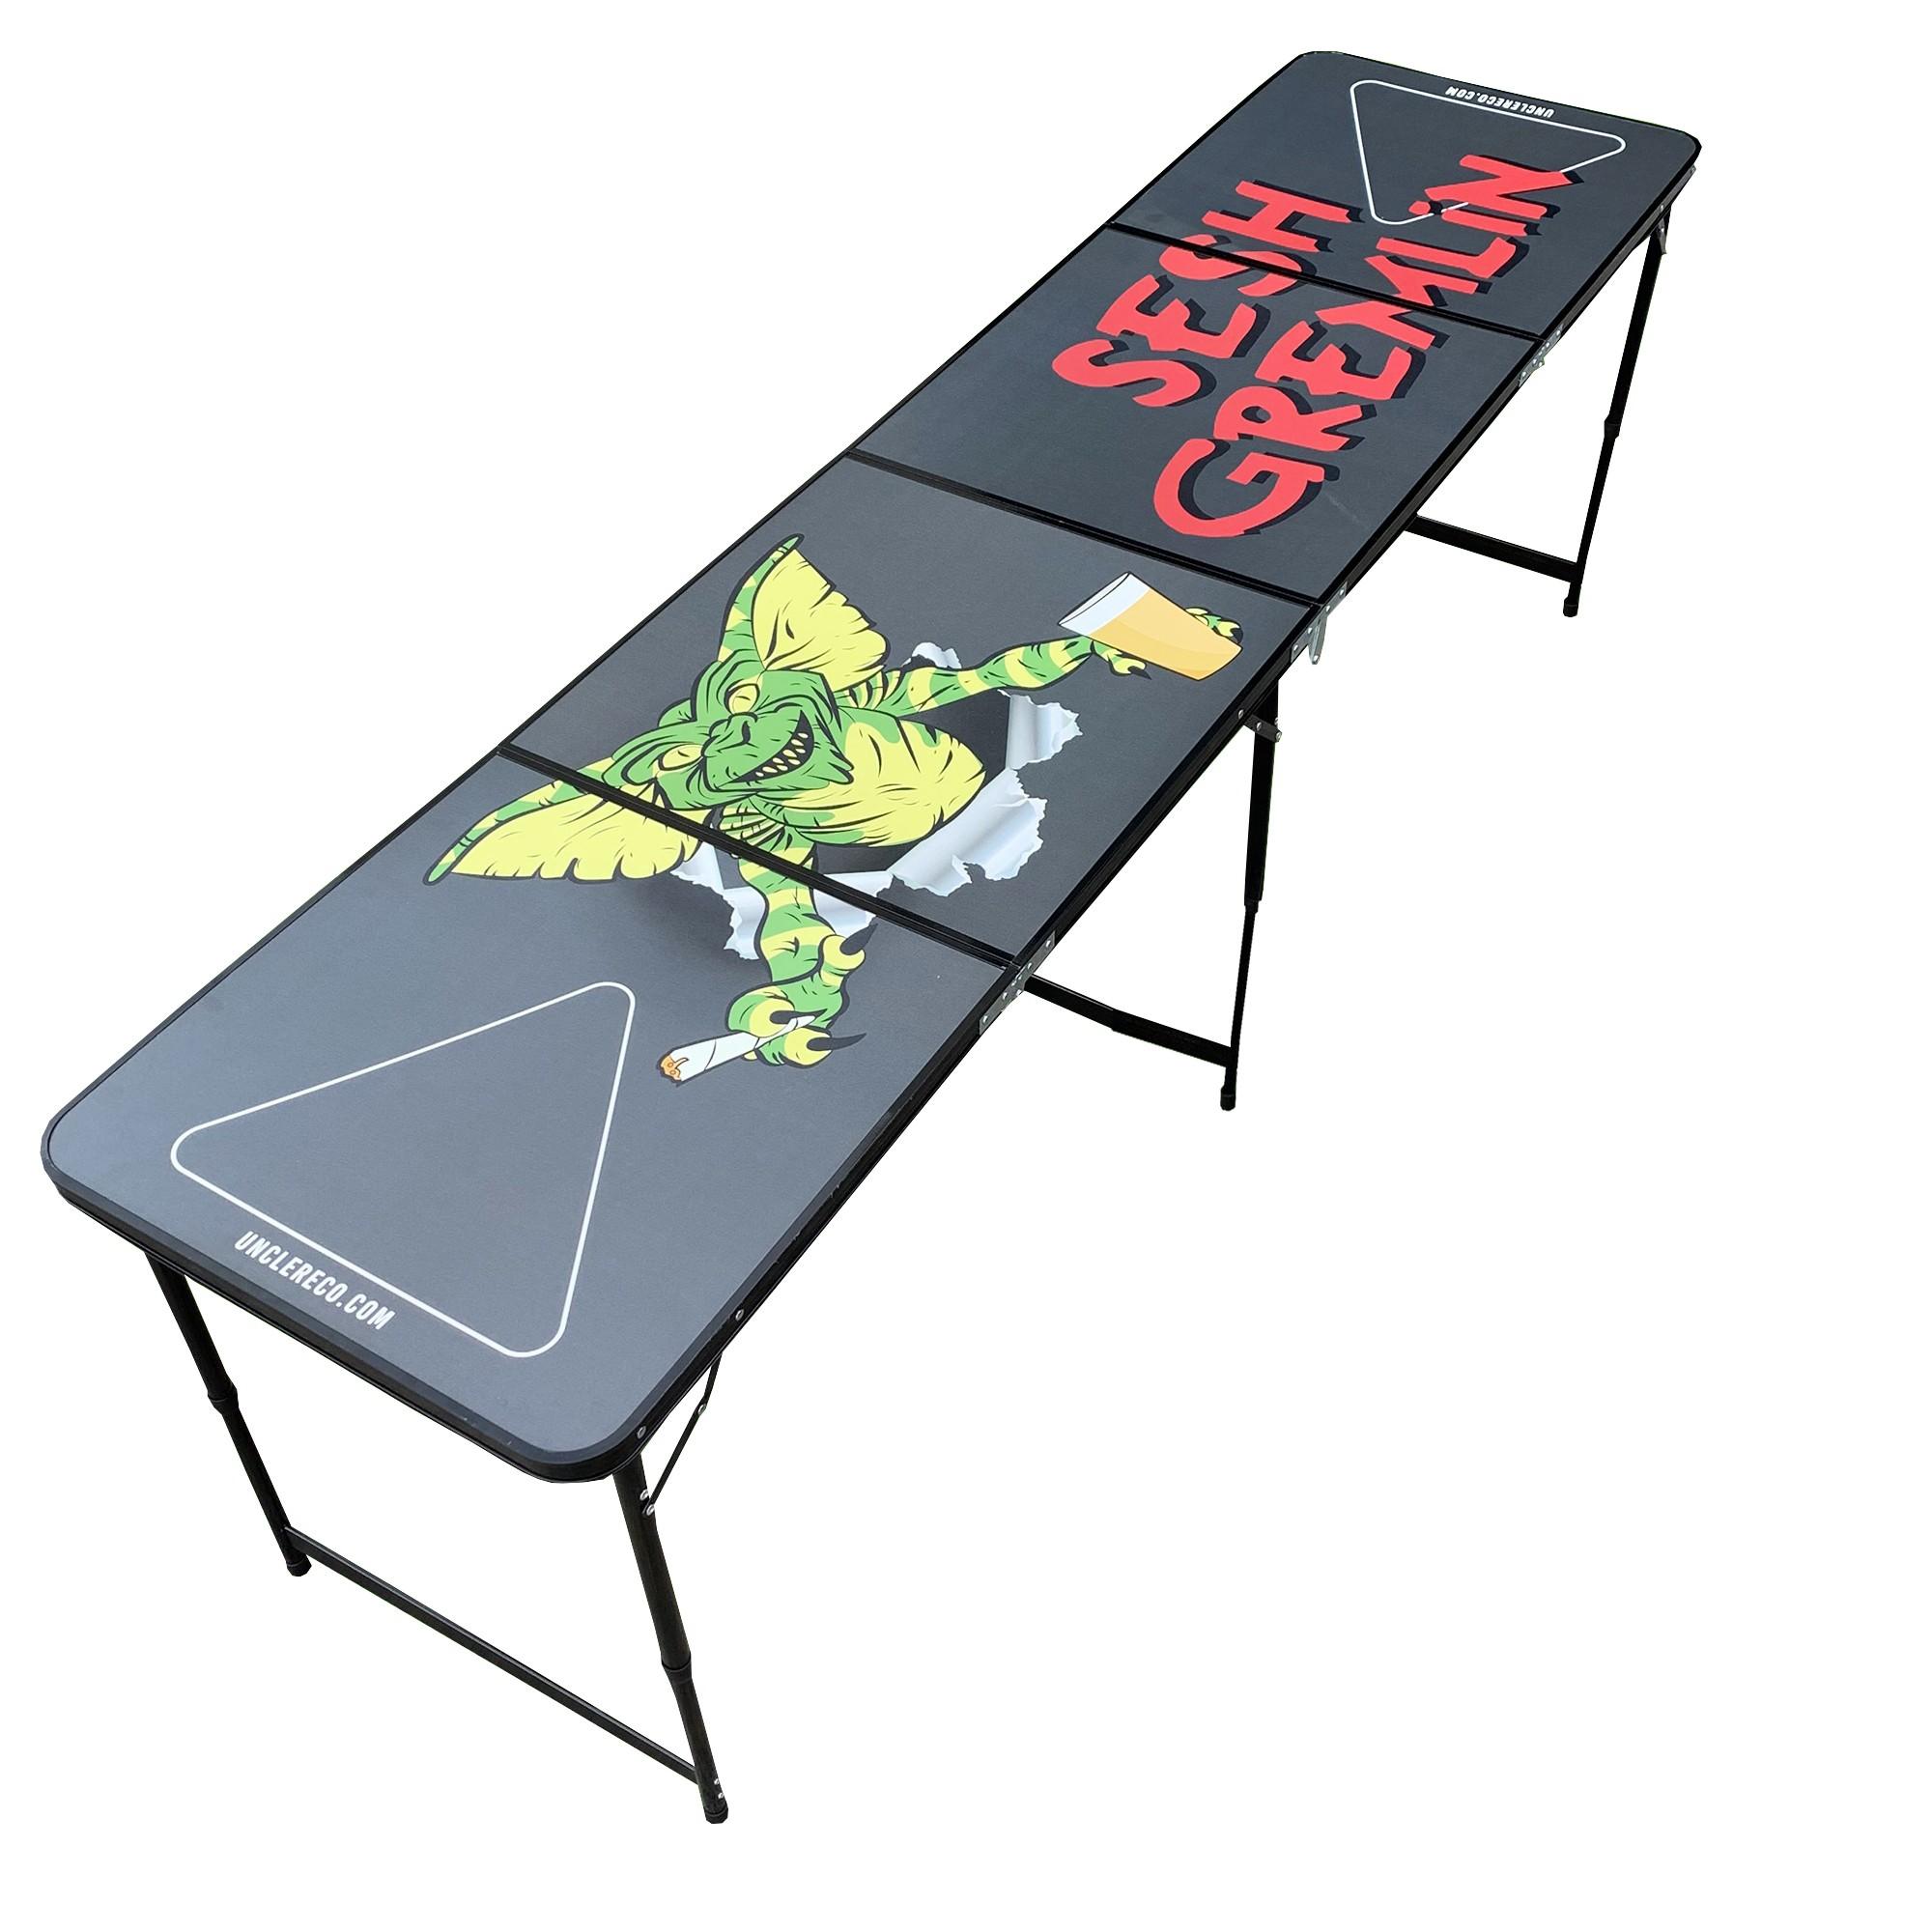 SESH GREMLIN BEER PONG TABLE